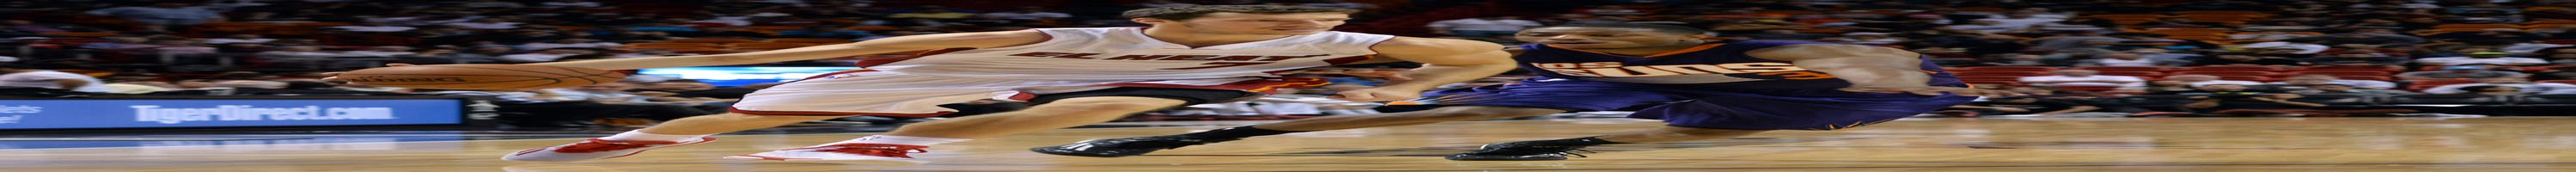 Notes: Goran Dragic buries past, returns with ex-Suns